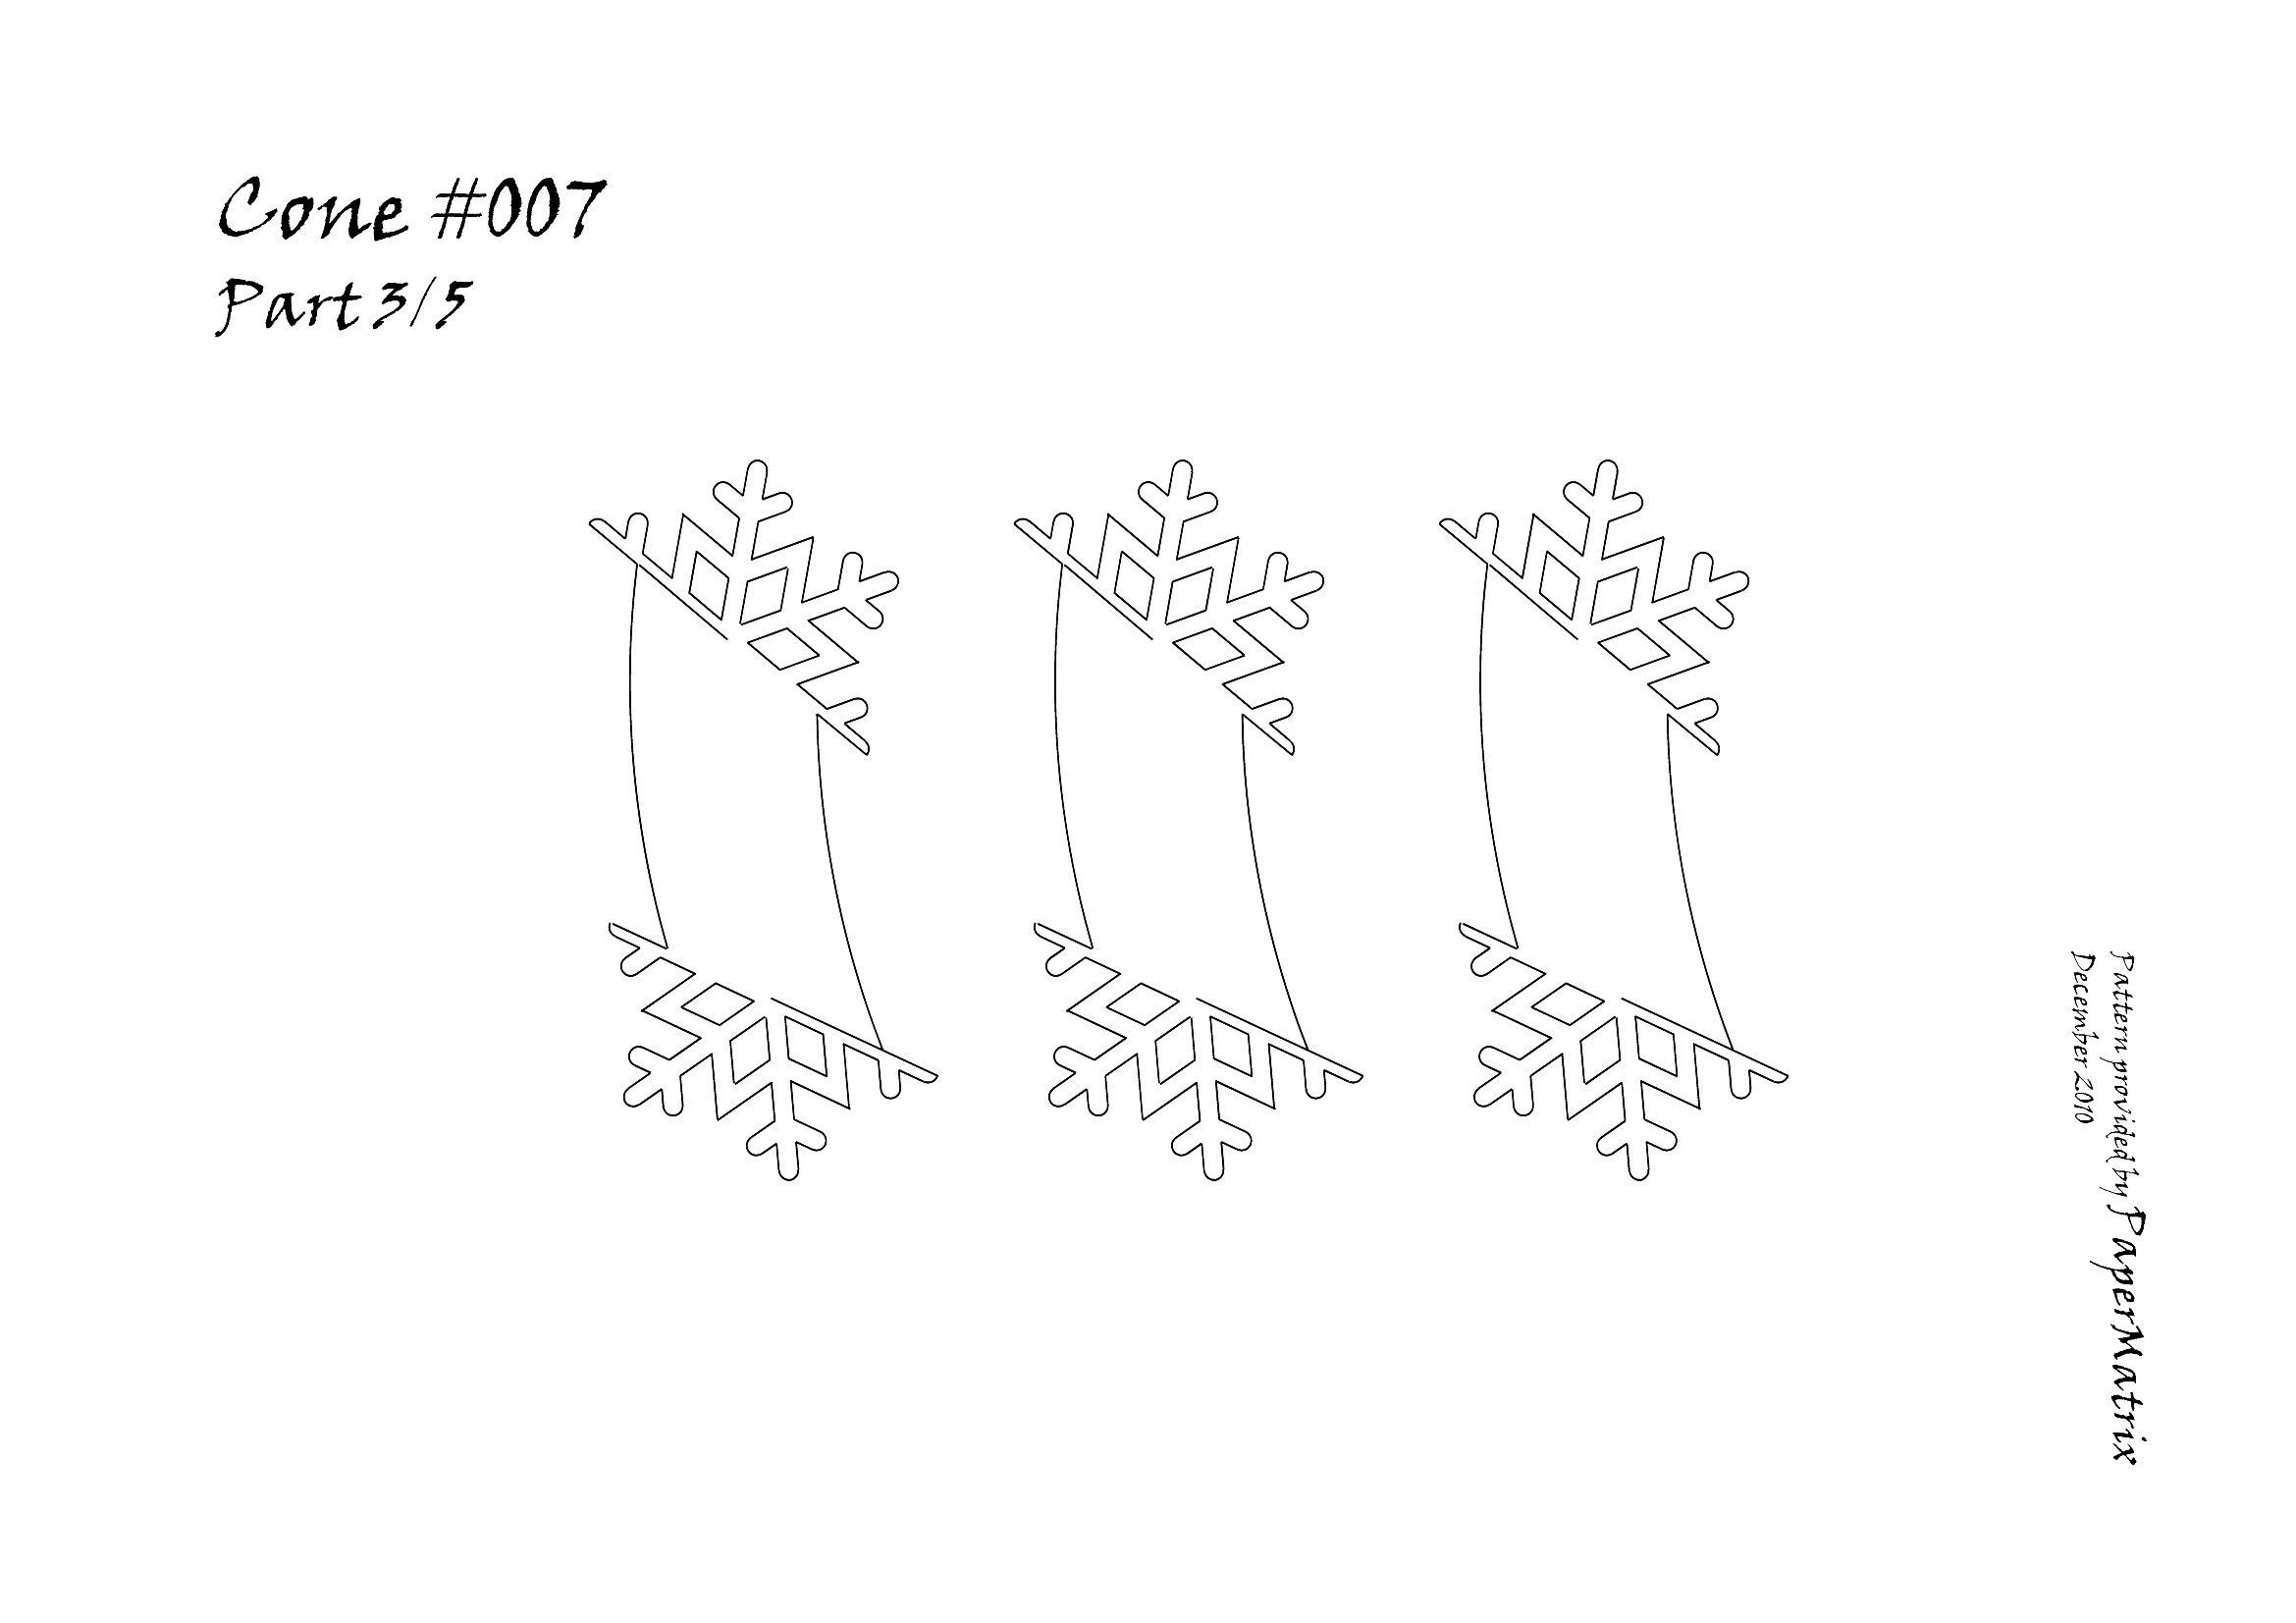 http://papermatrix.files.wordpress.com/2010/12/cone-007-3.jpg